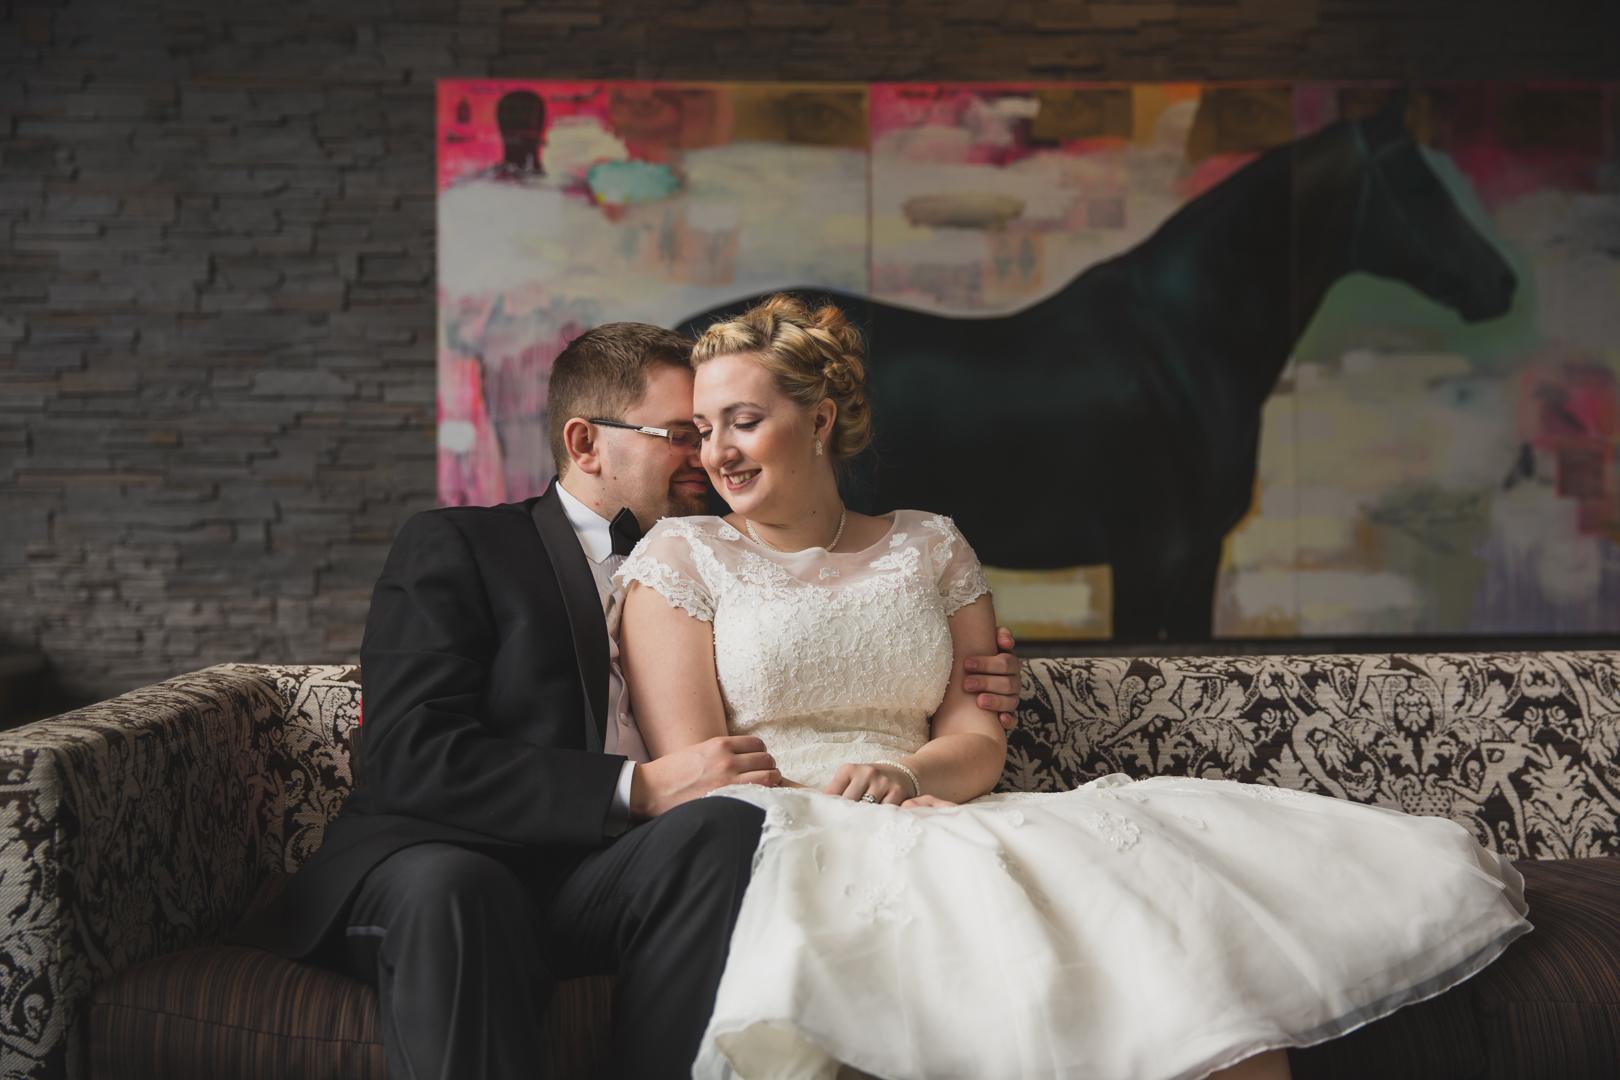 The Wedding - Date: February 3, 2015Where: Calgary, Alberta